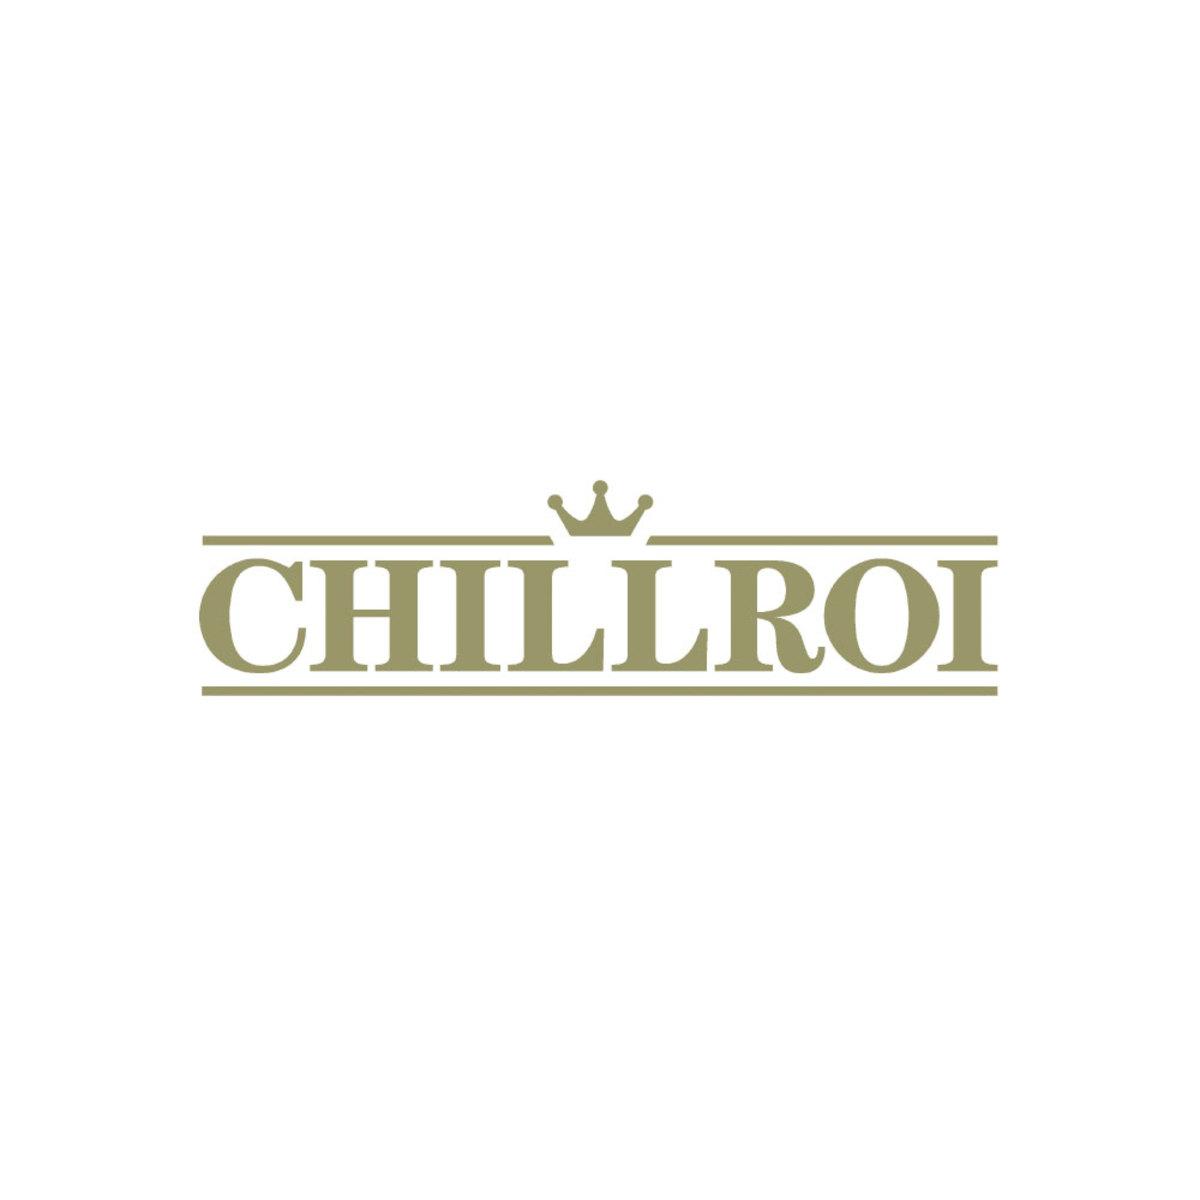 Bild 4 von Chillroi BBQ Grillpavillon mit LED-Beleuchtung